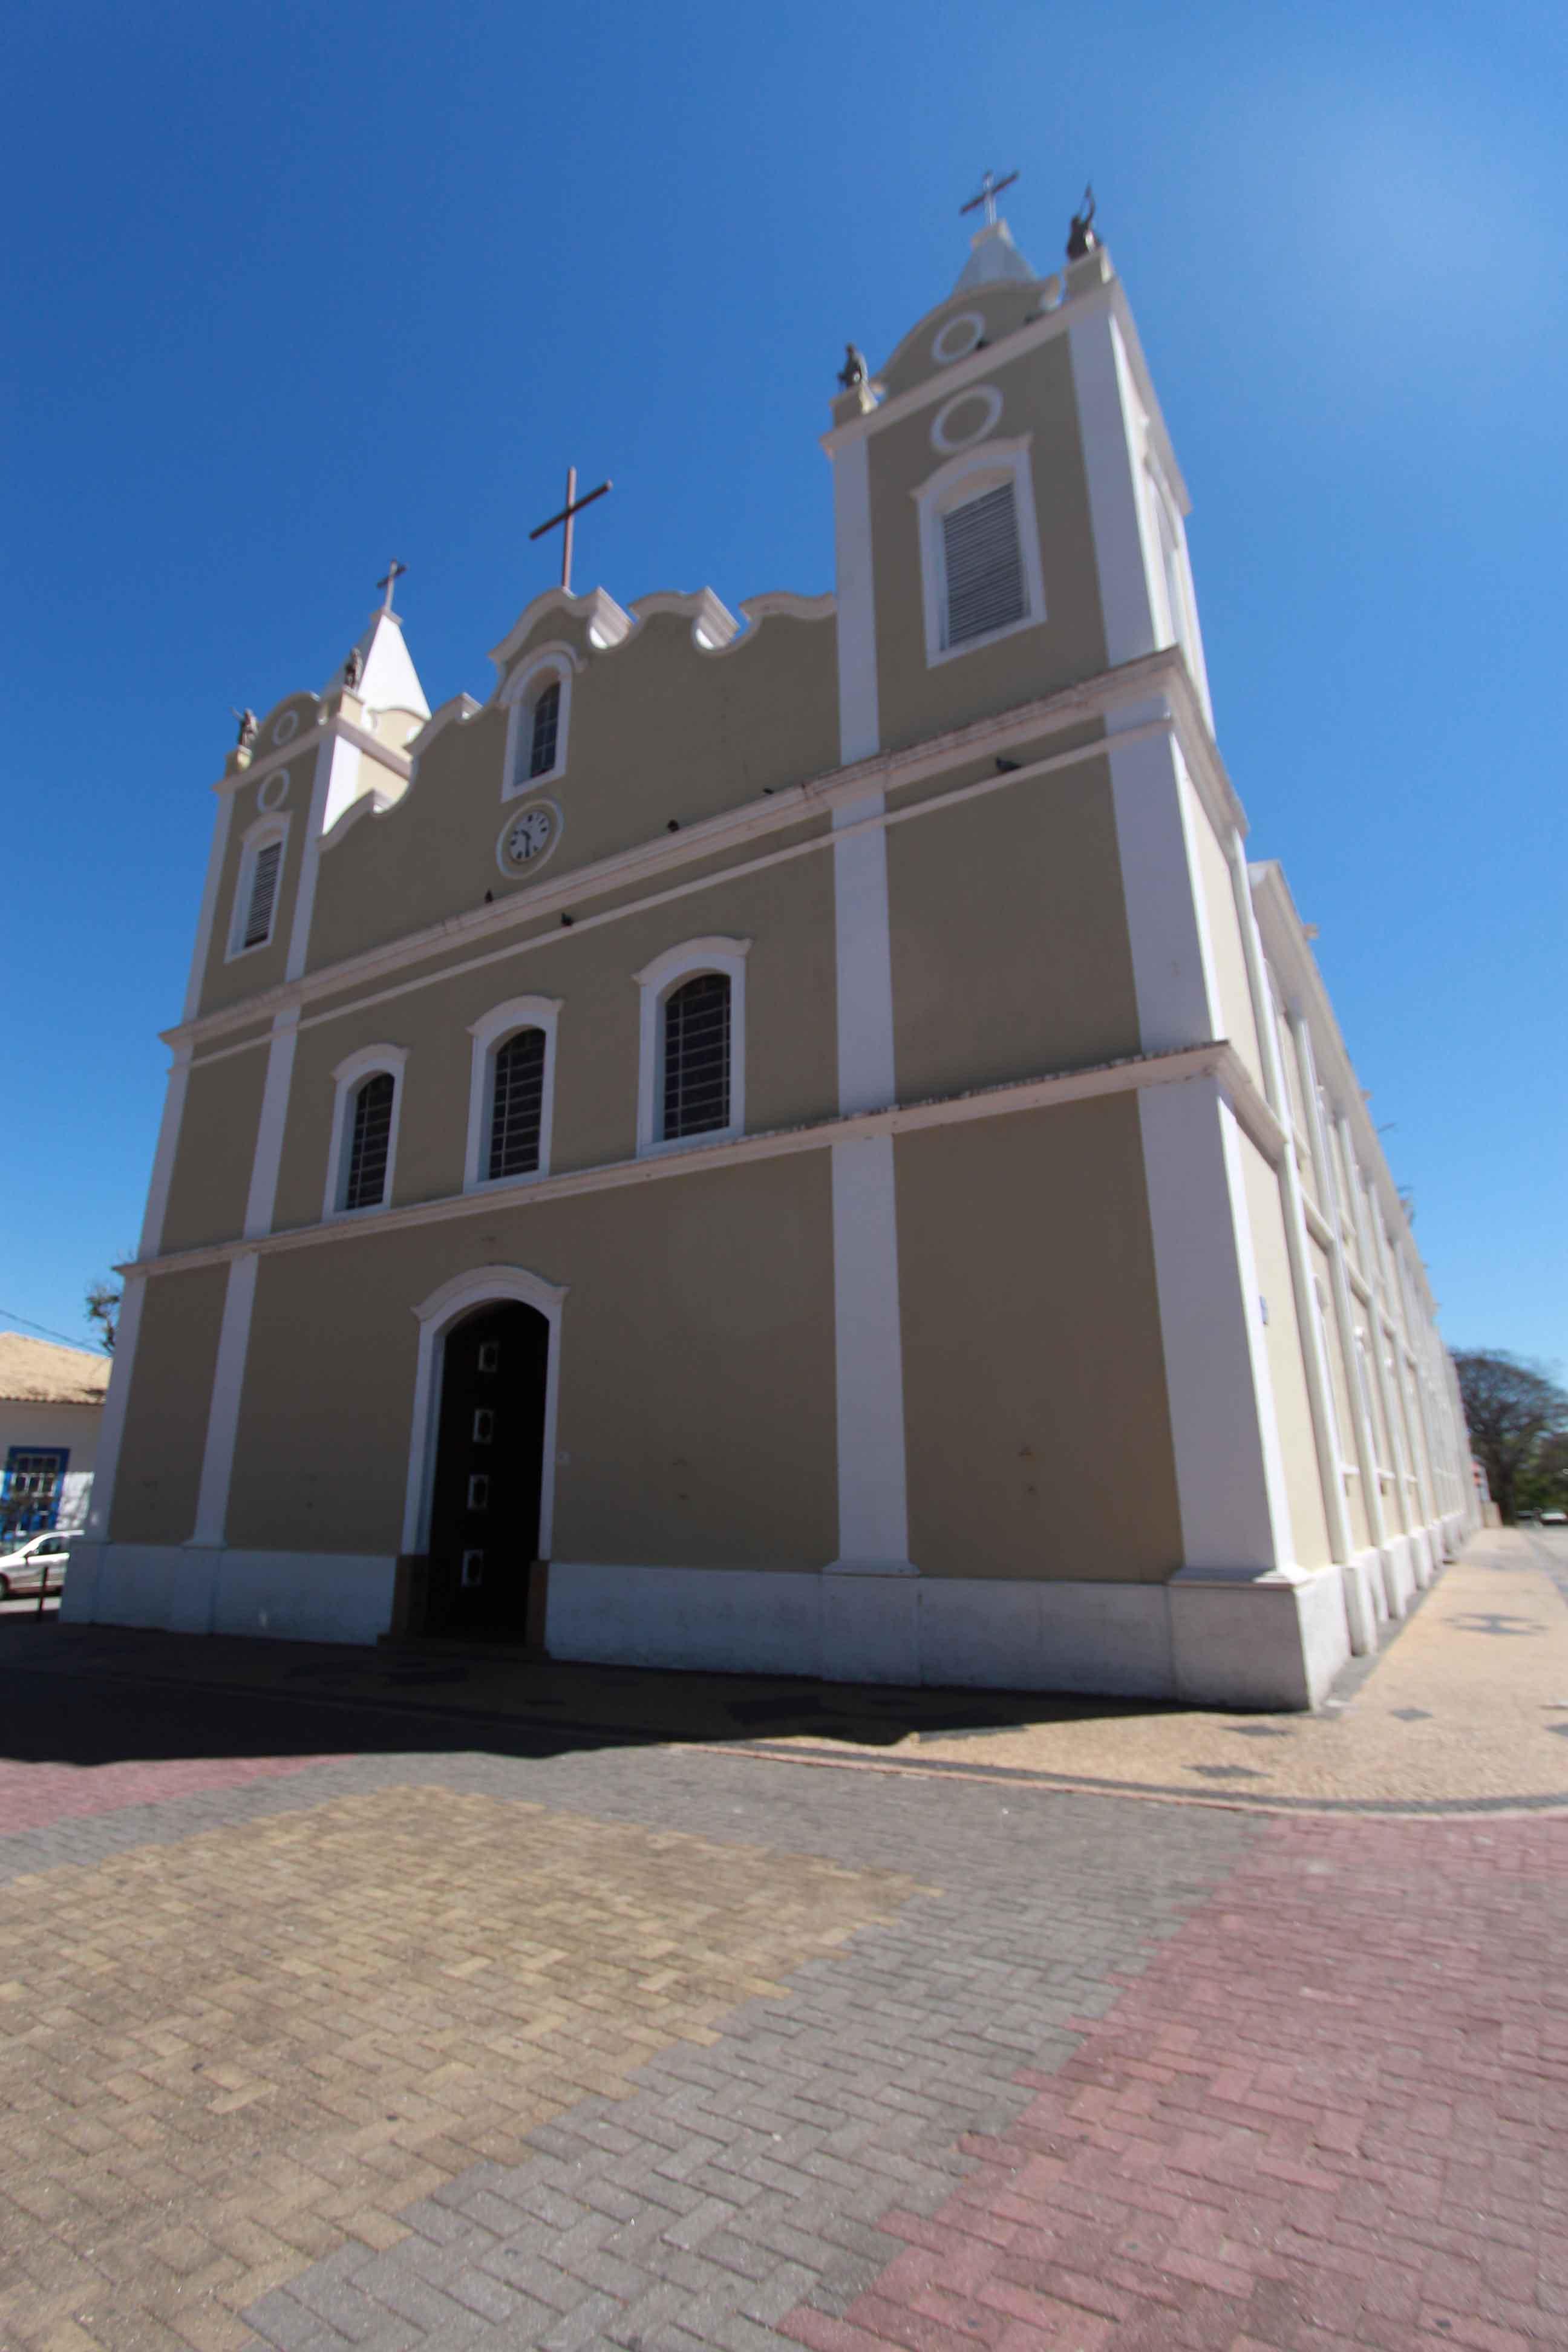 indaiatuba-turismo-religioso-igreja-matriz-calendaria-IMG_7421-bx